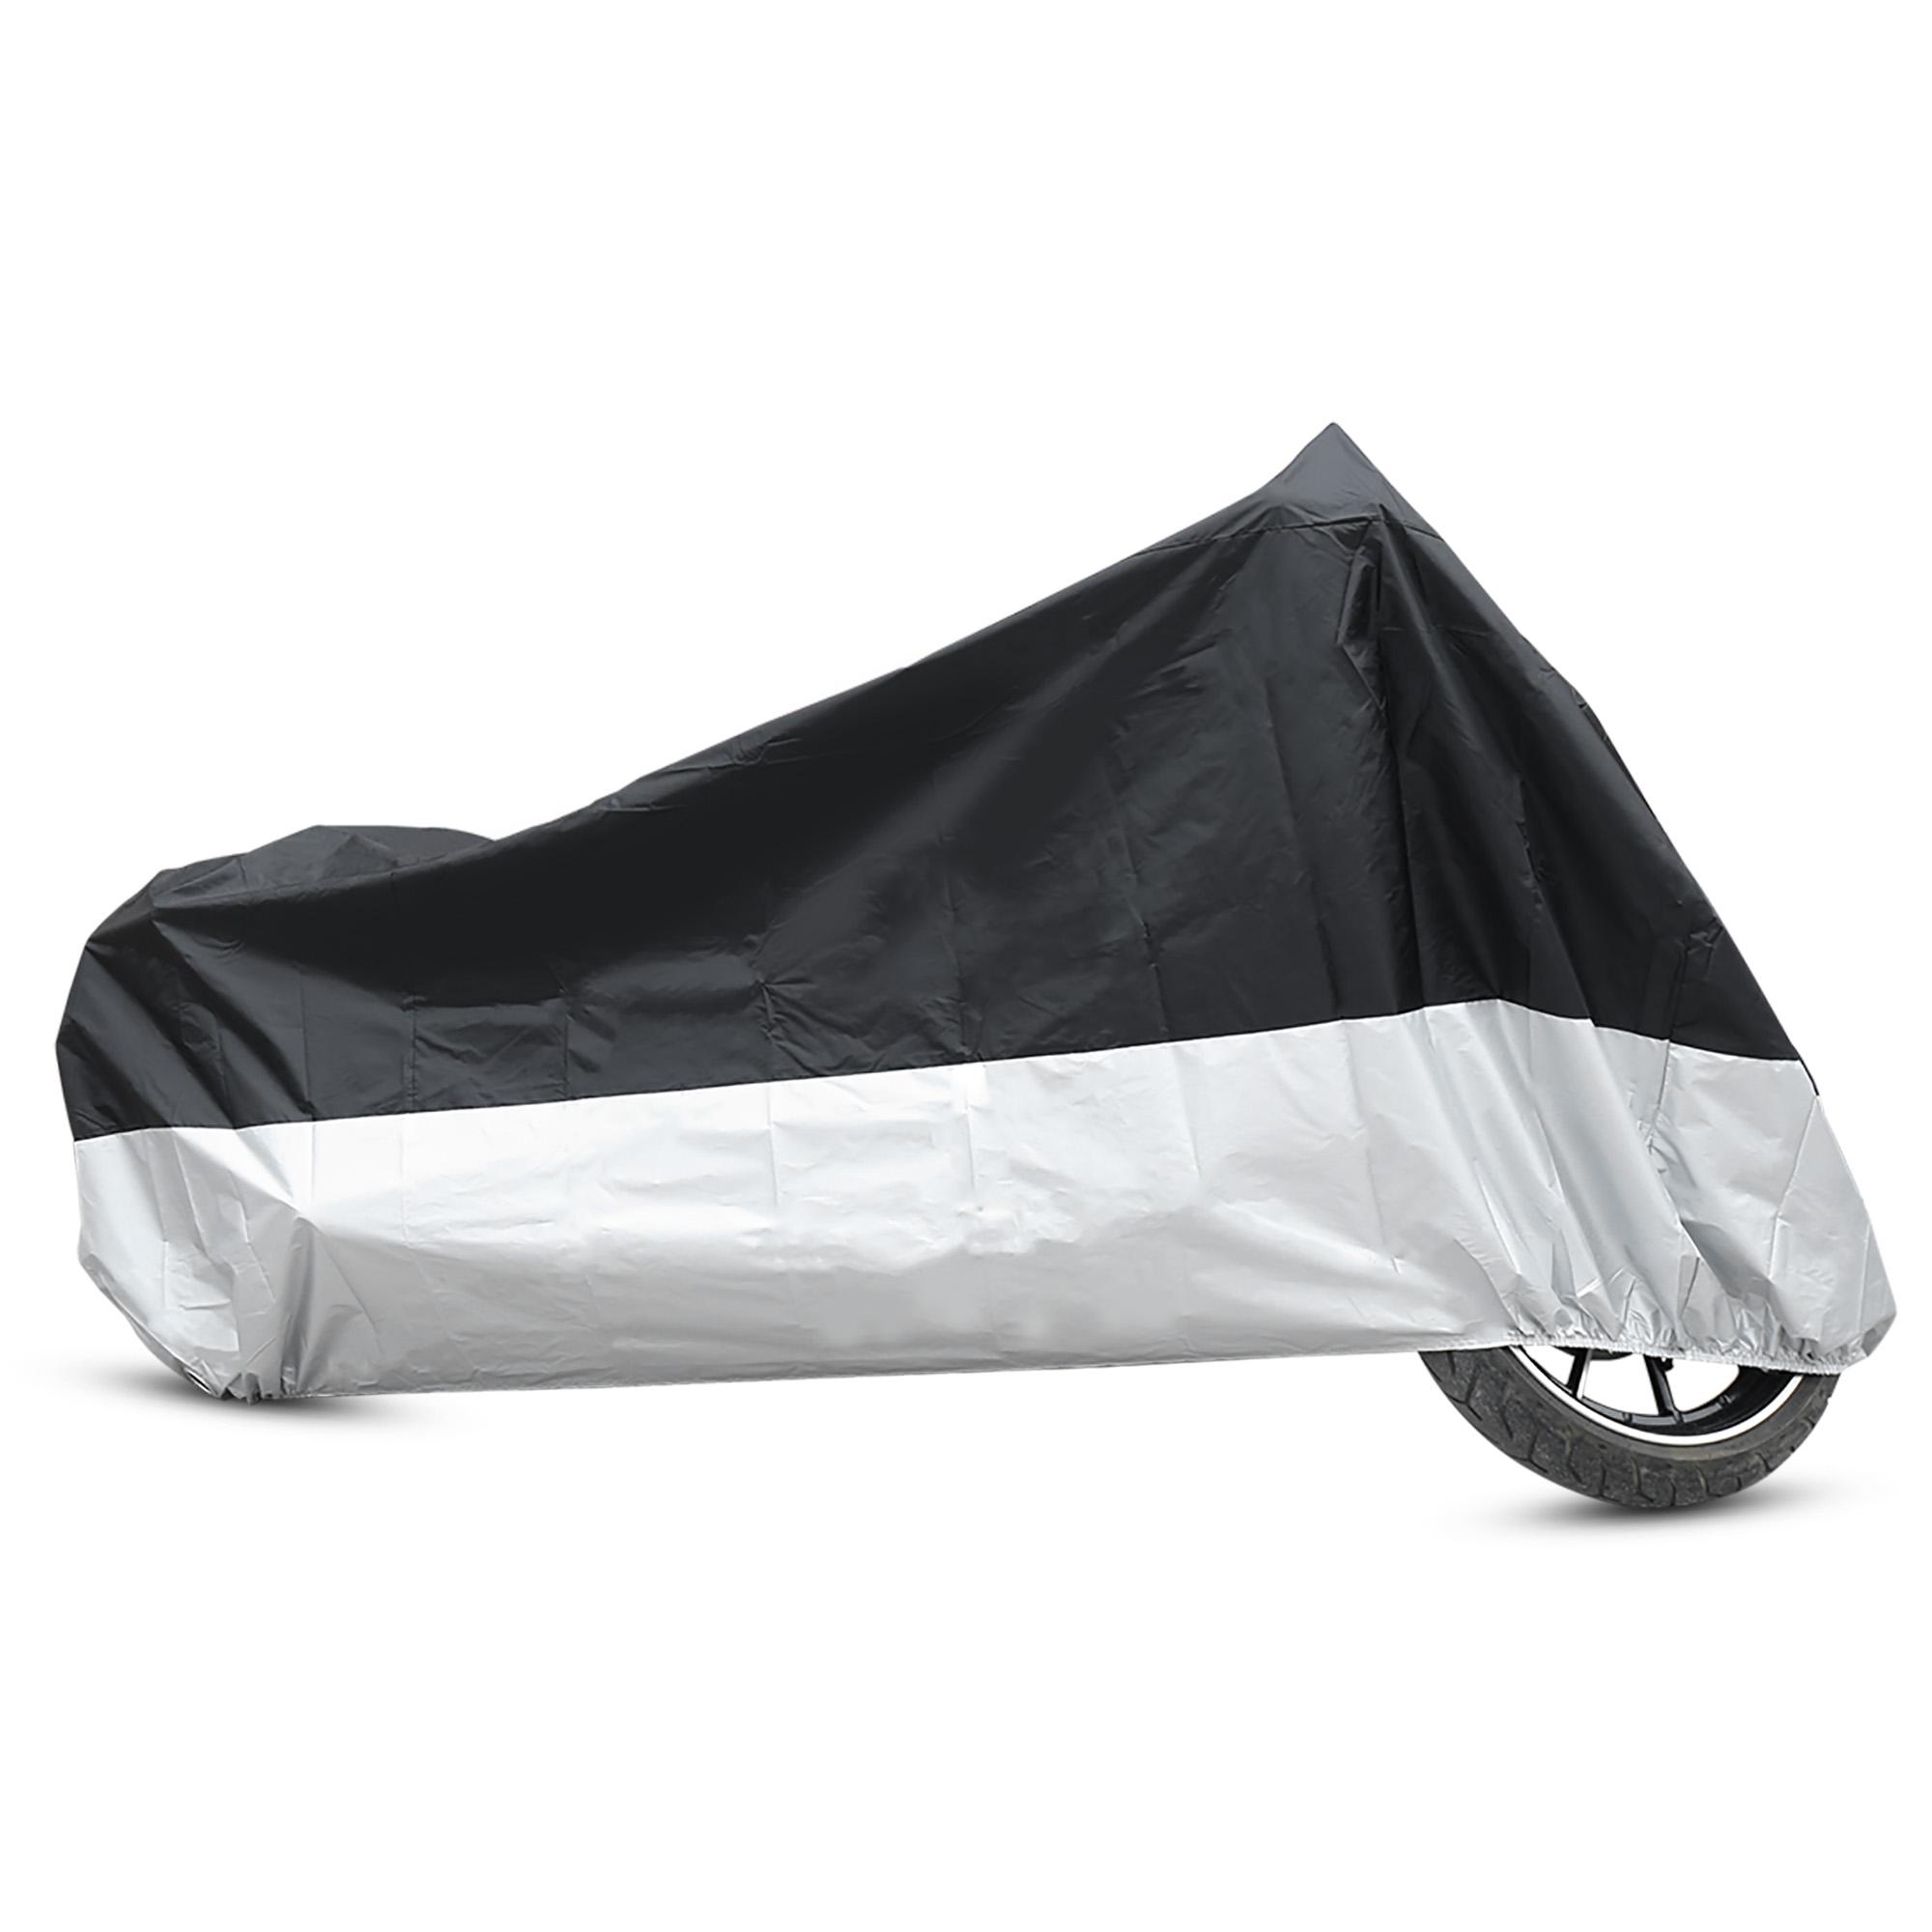 XXL 180T Rain Dust Motorcycle Cover Black+Silver Outdoor Waterproof UV Protector